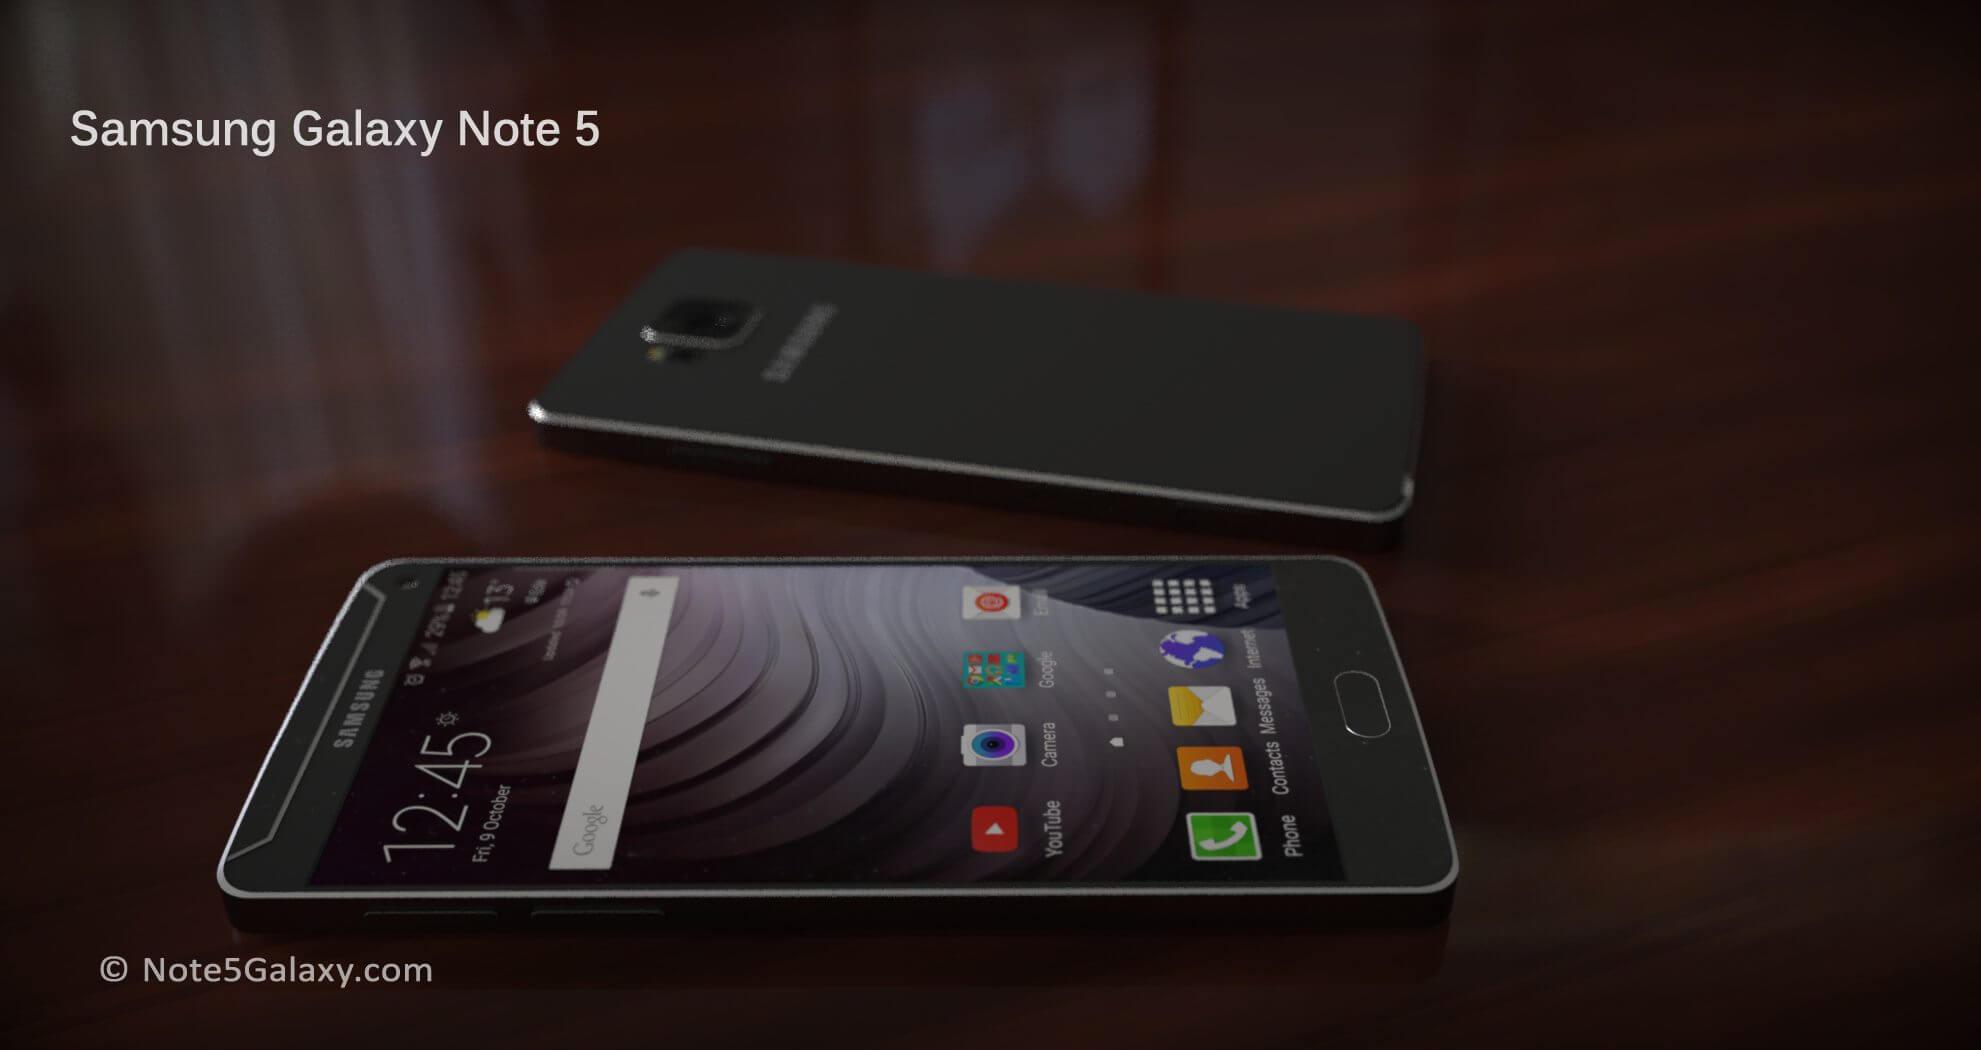 galaxy note 5 6 - Samsung planeja anunciar o Galaxy Note 5 no final de julho